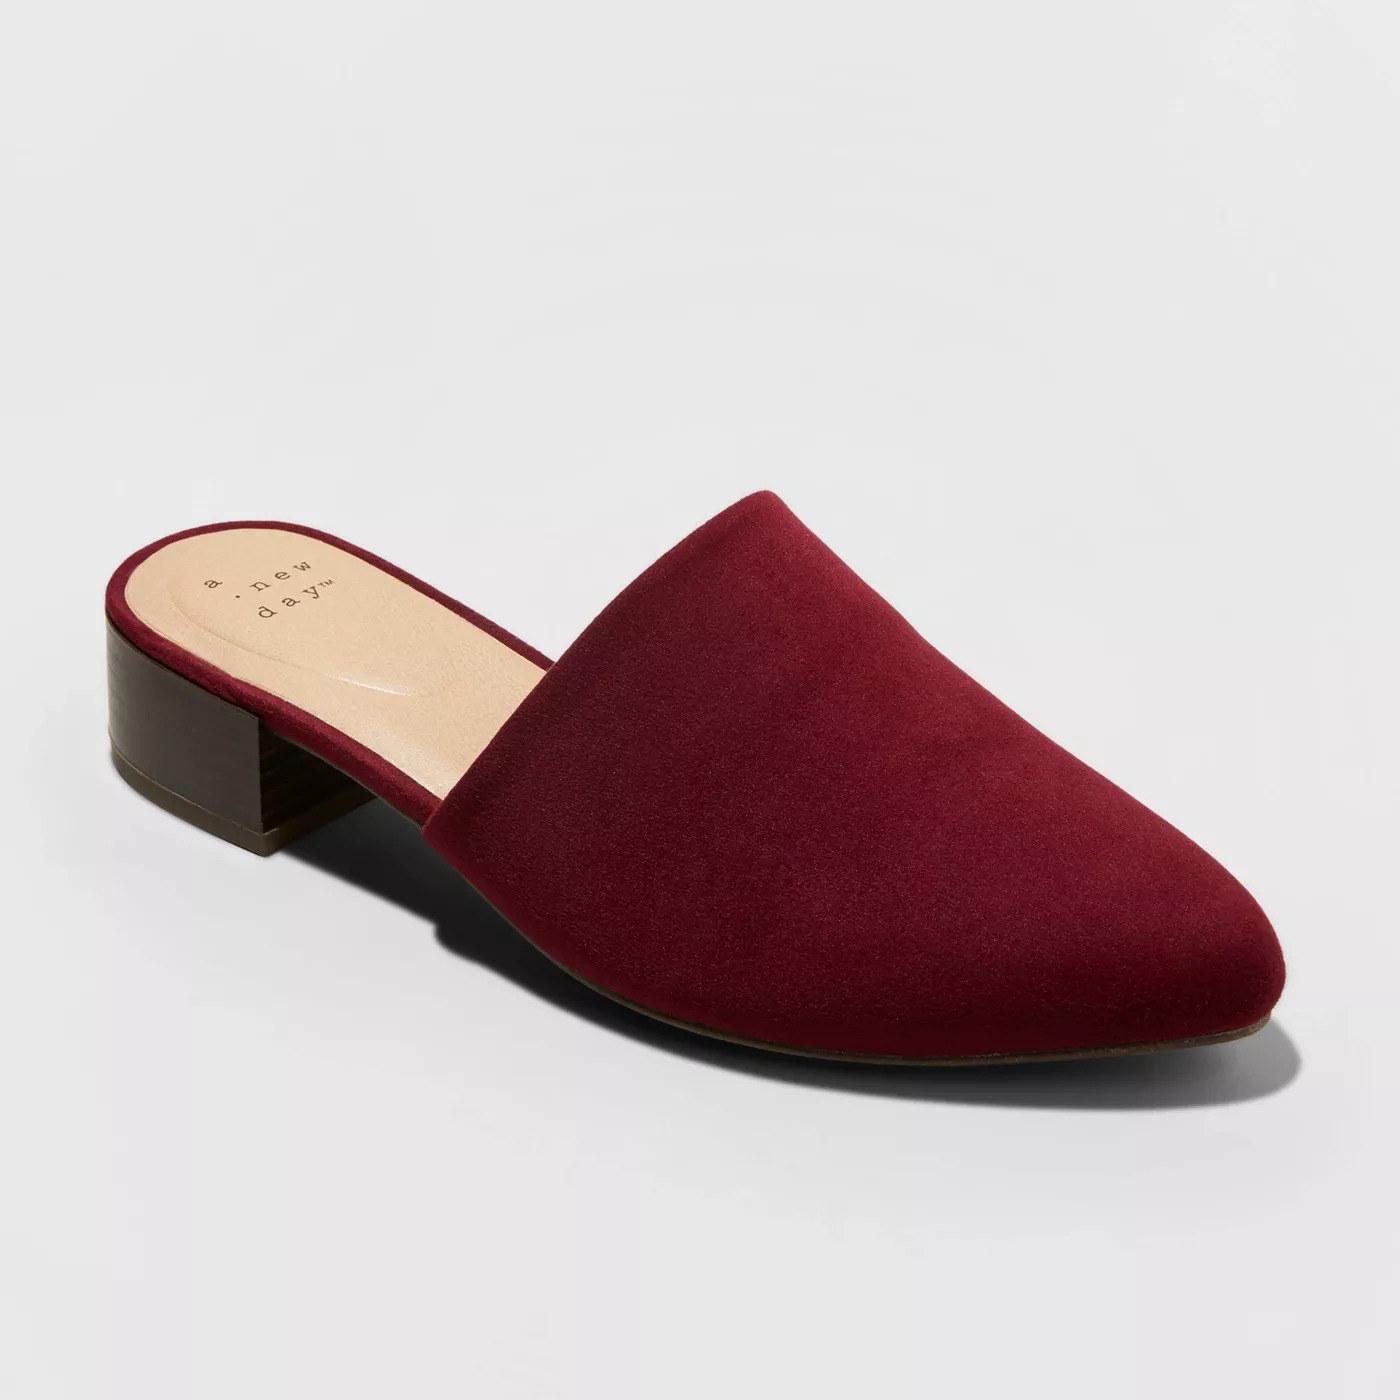 A burgundy mule with a black low block heel